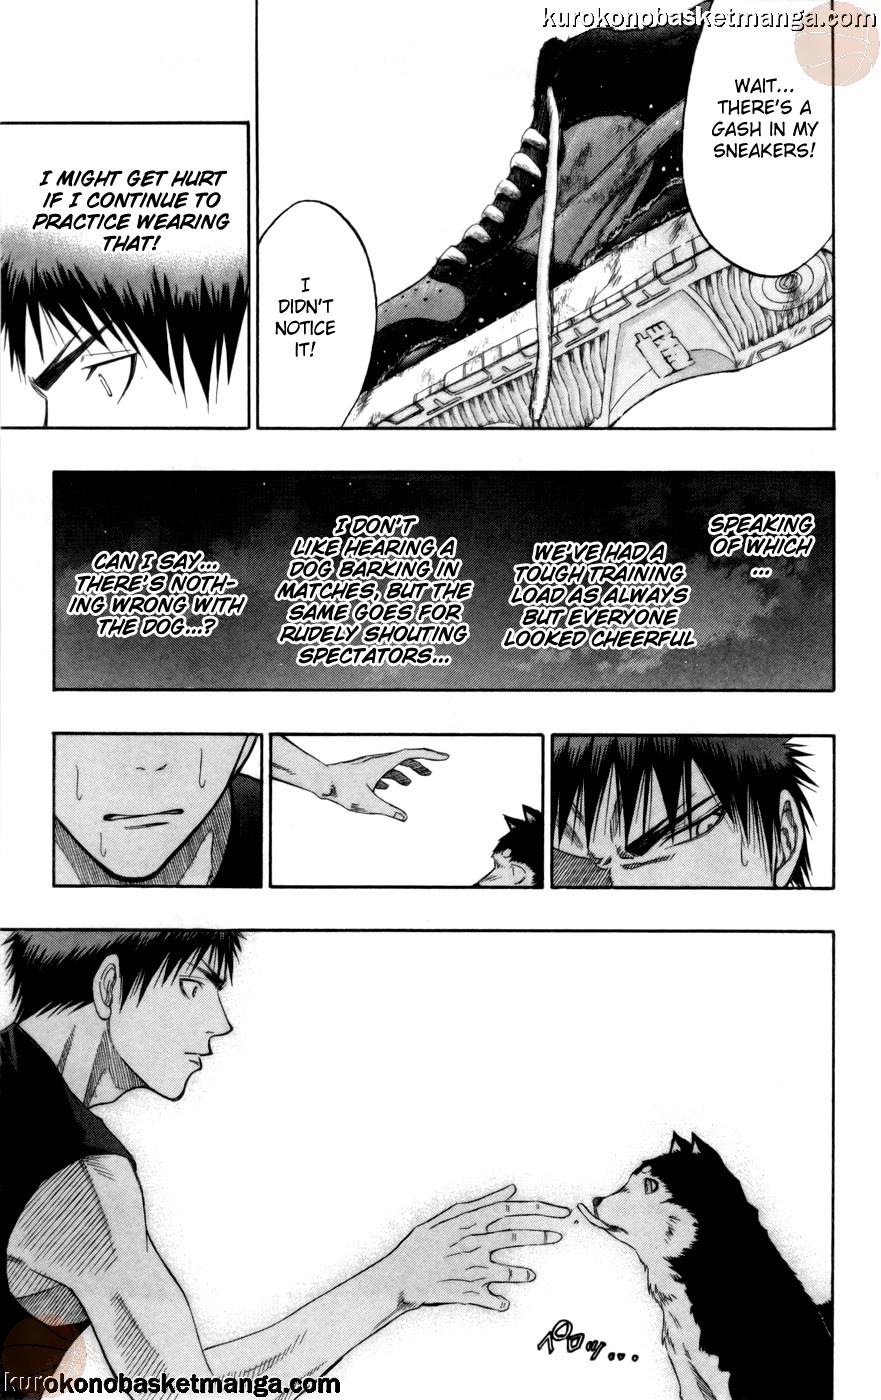 Kuroko no Basket Manga Chapter 74 - Image 17